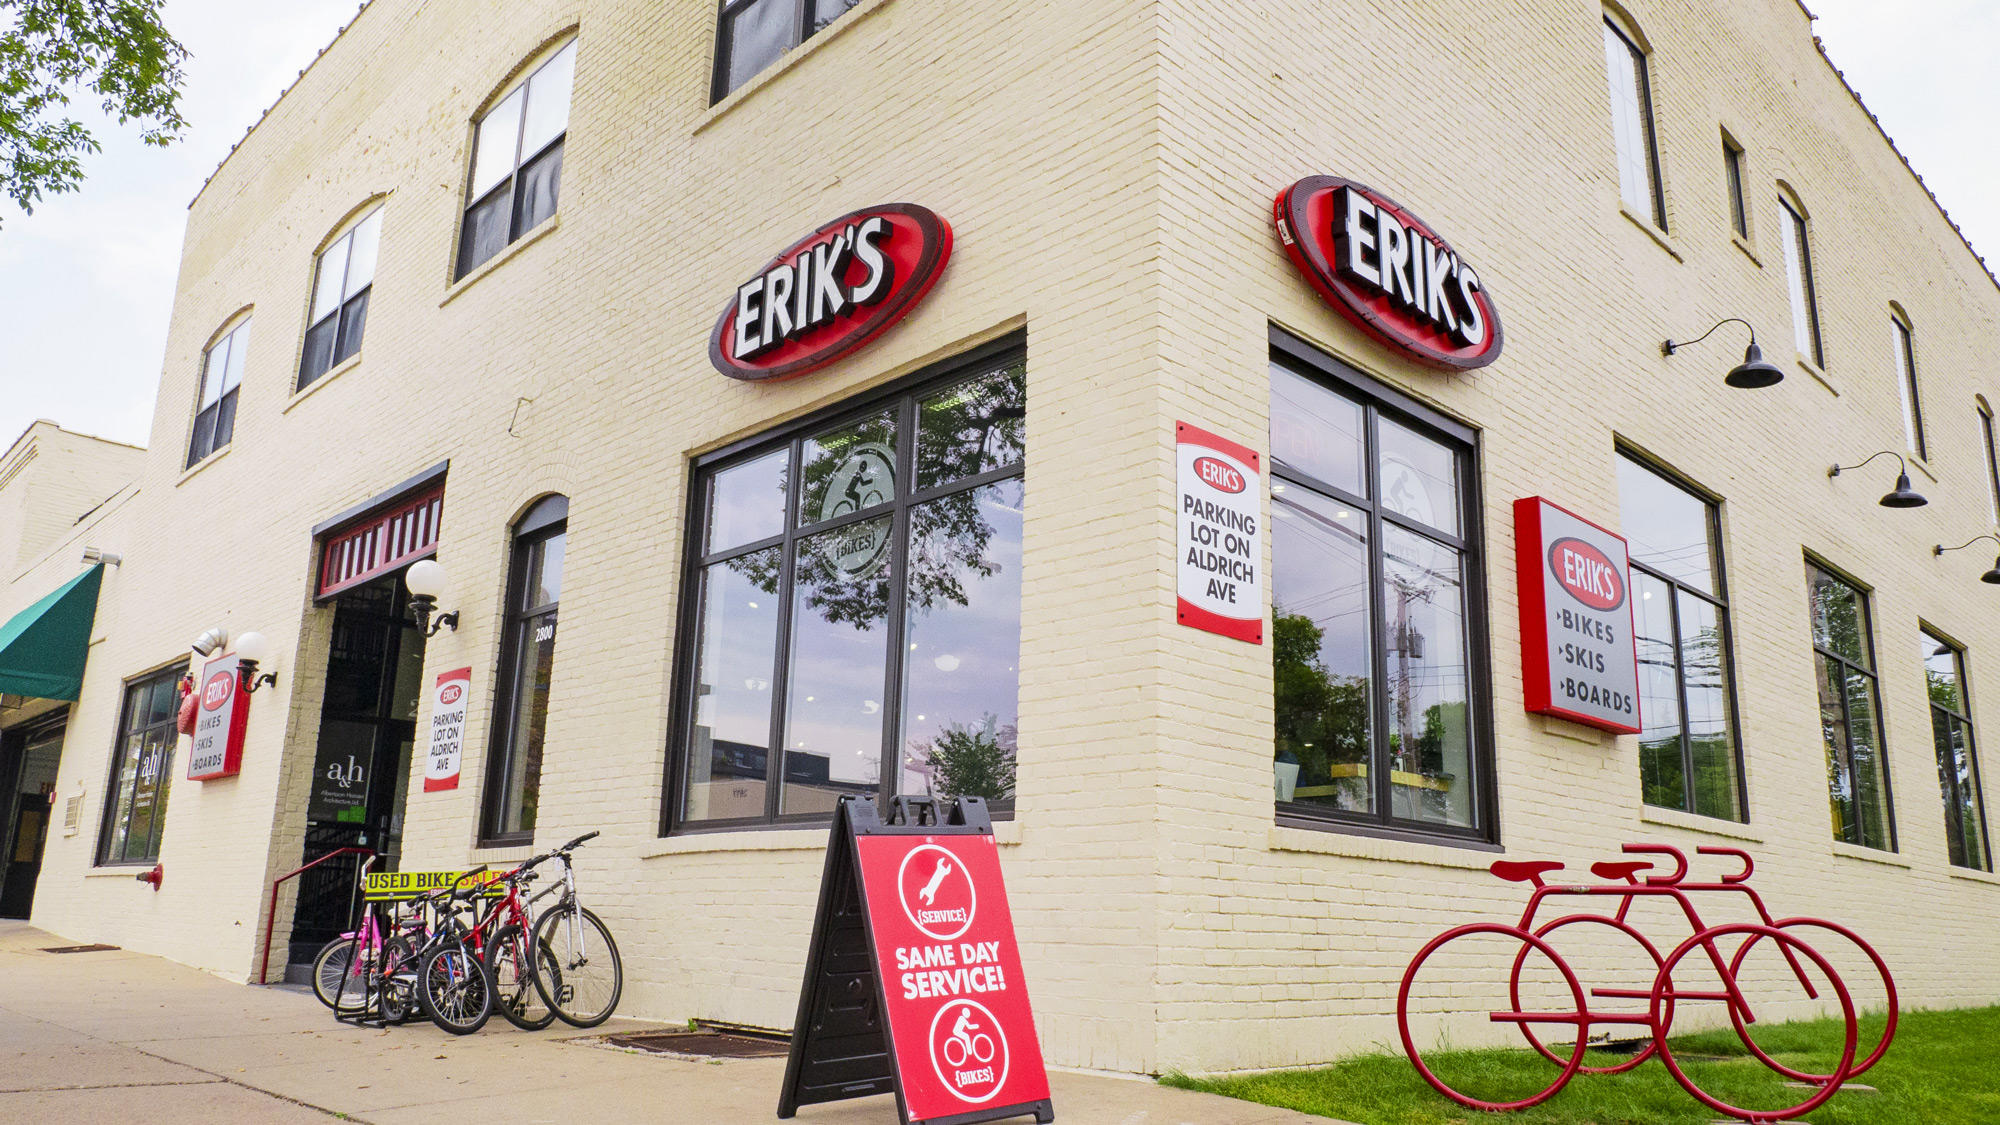 Minneapolis Lynlake Eriks bike shop storefront